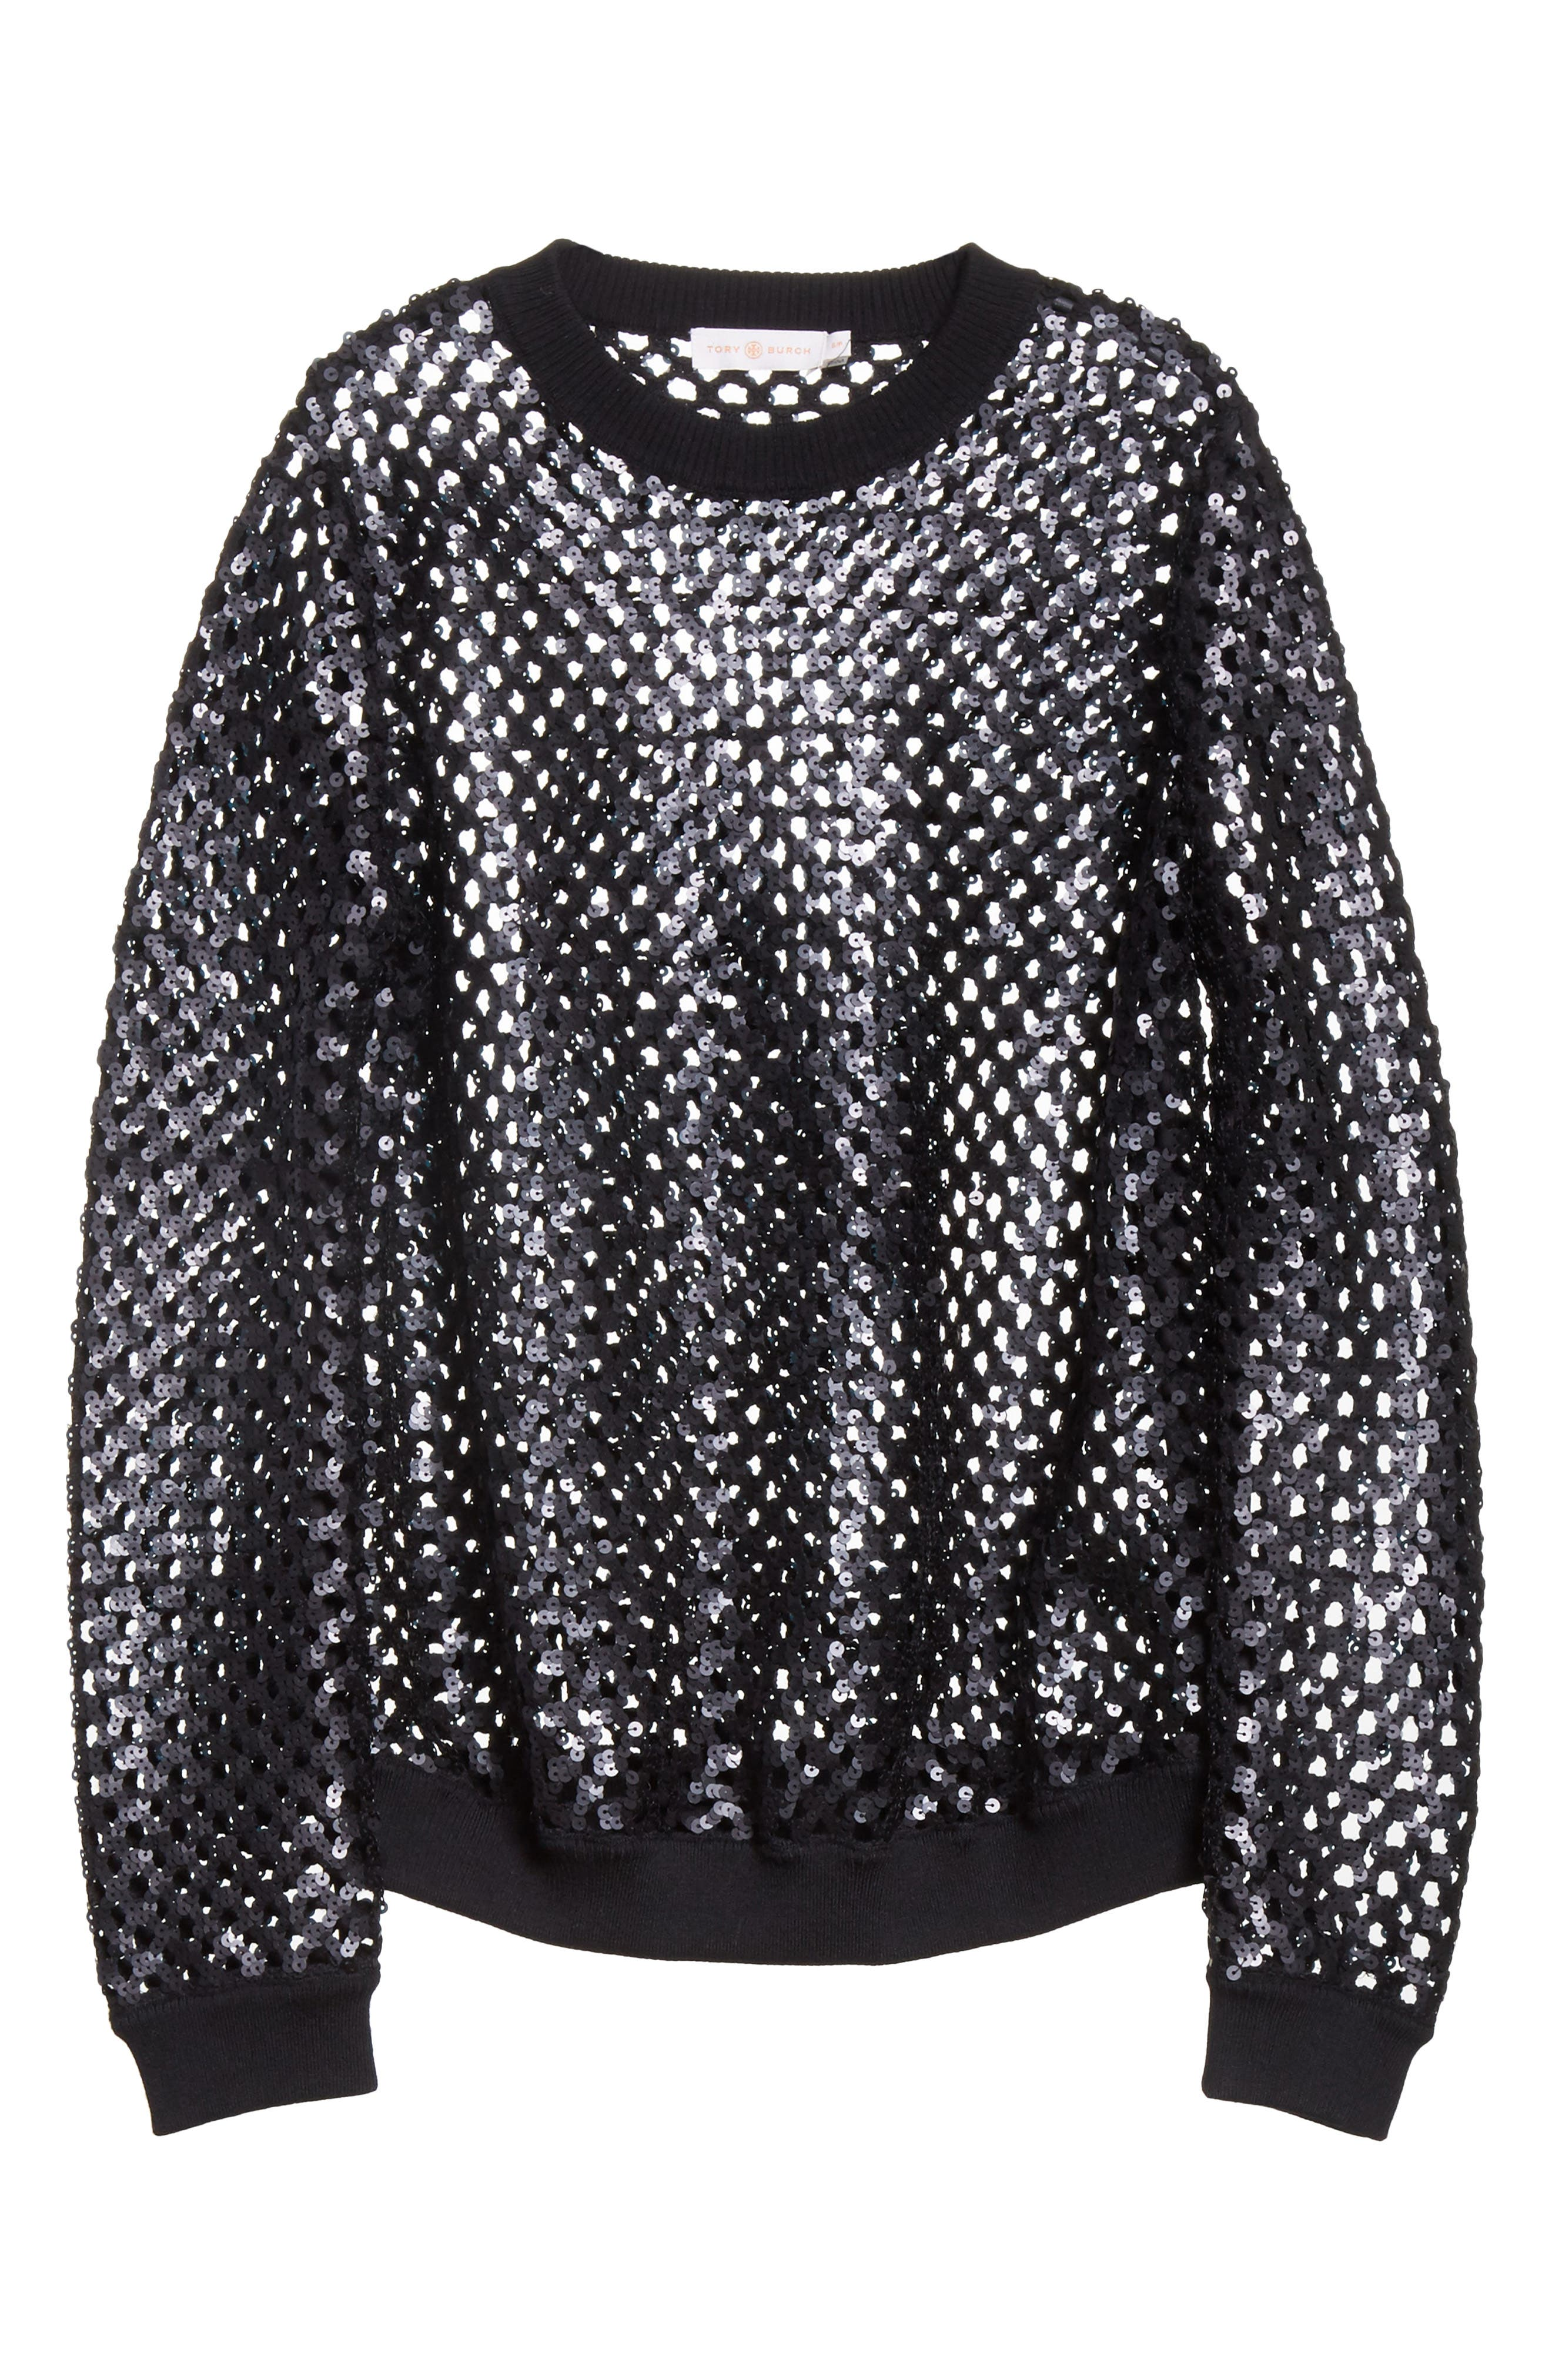 Lansing Sequin Mesh Sweater,                             Alternate thumbnail 6, color,                             001